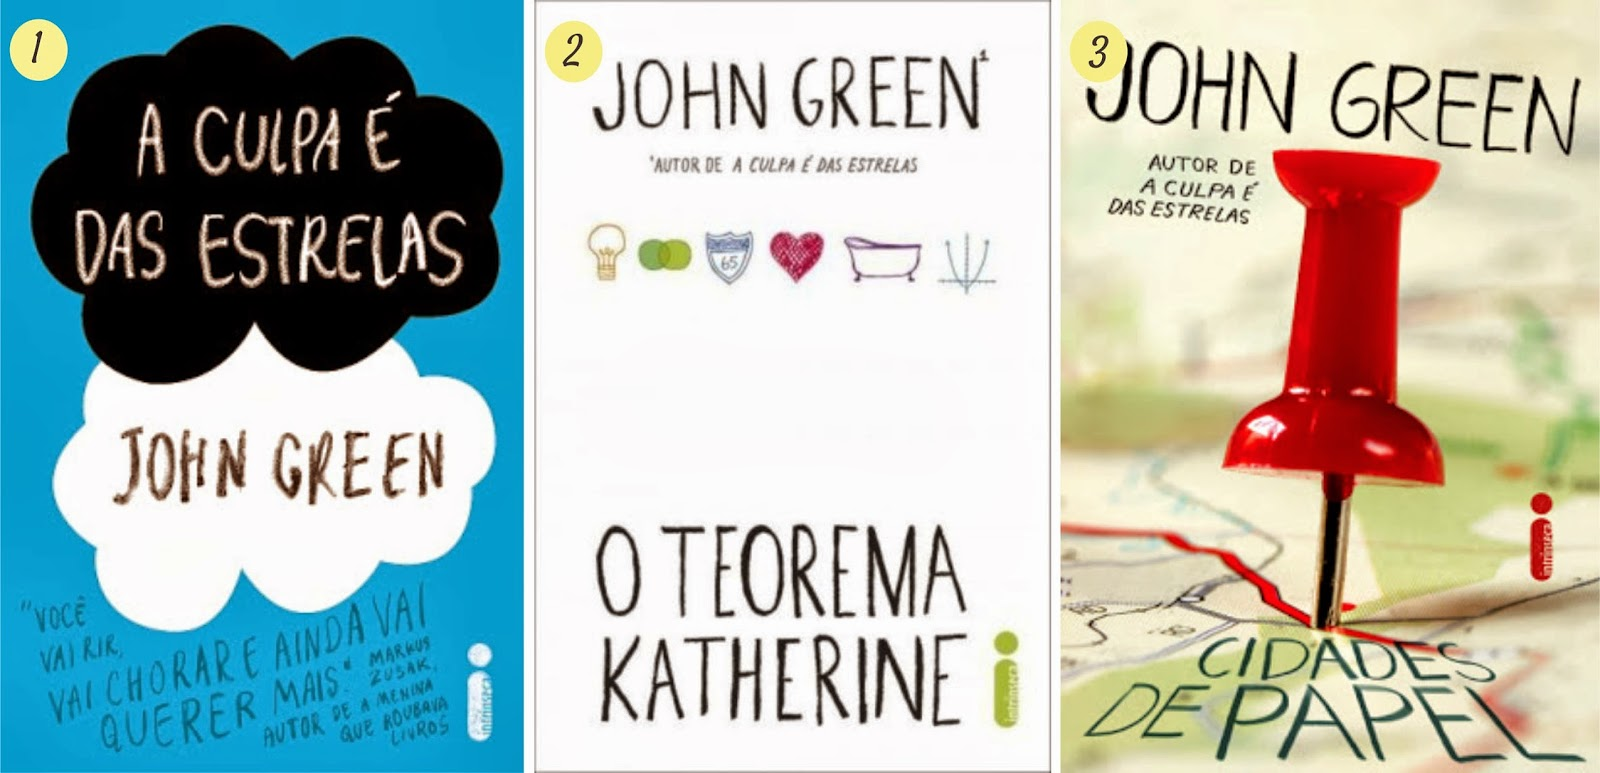 3+livros+john+green.jpg